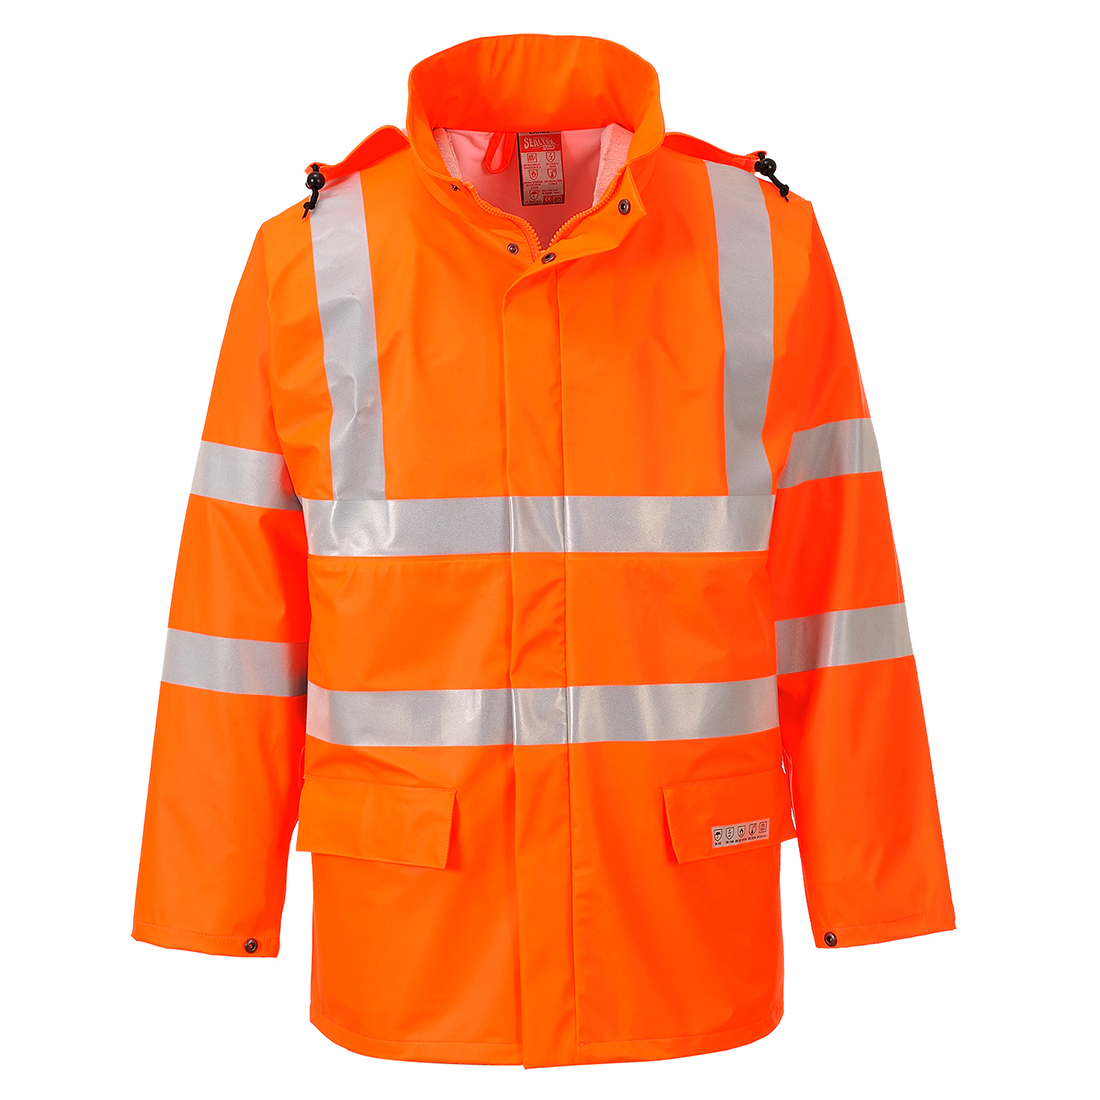 Sealtex Flame Hi-Vis Jacket Orange L